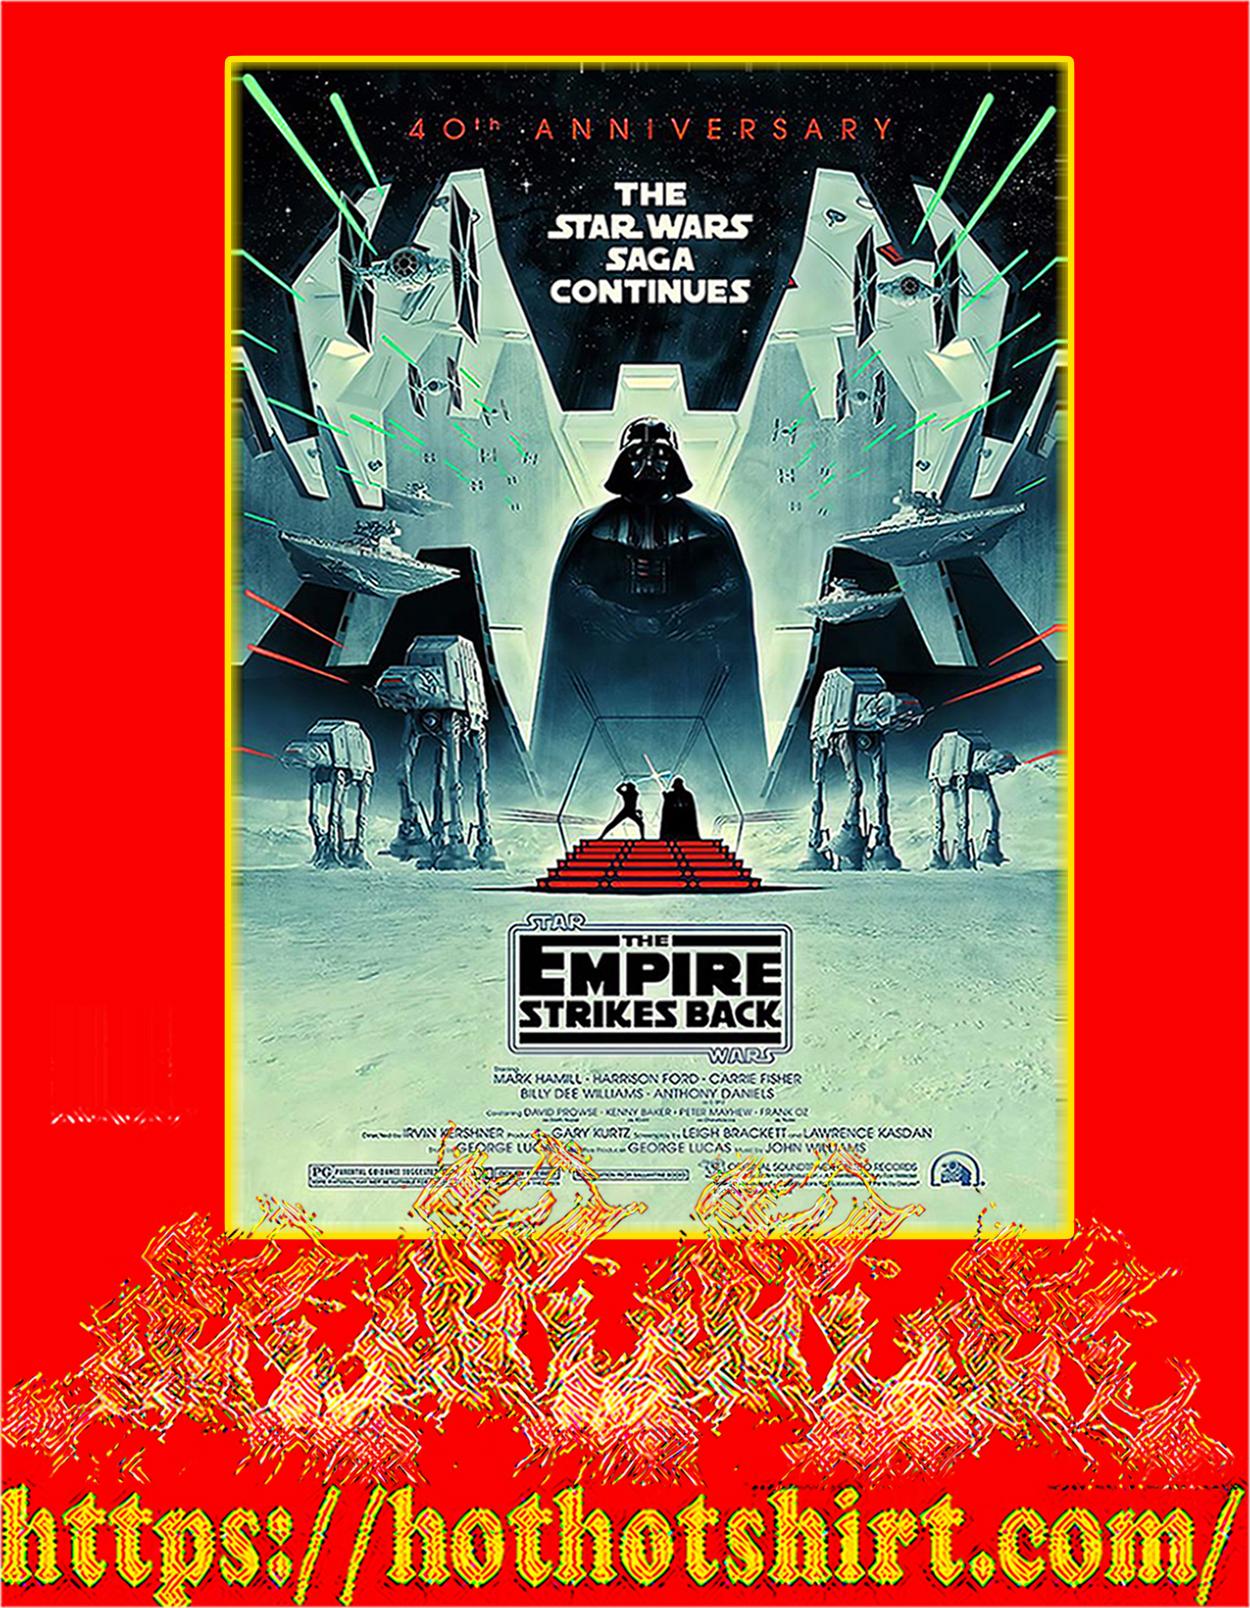 The star wars saga continues 40th anniversary poster - A2